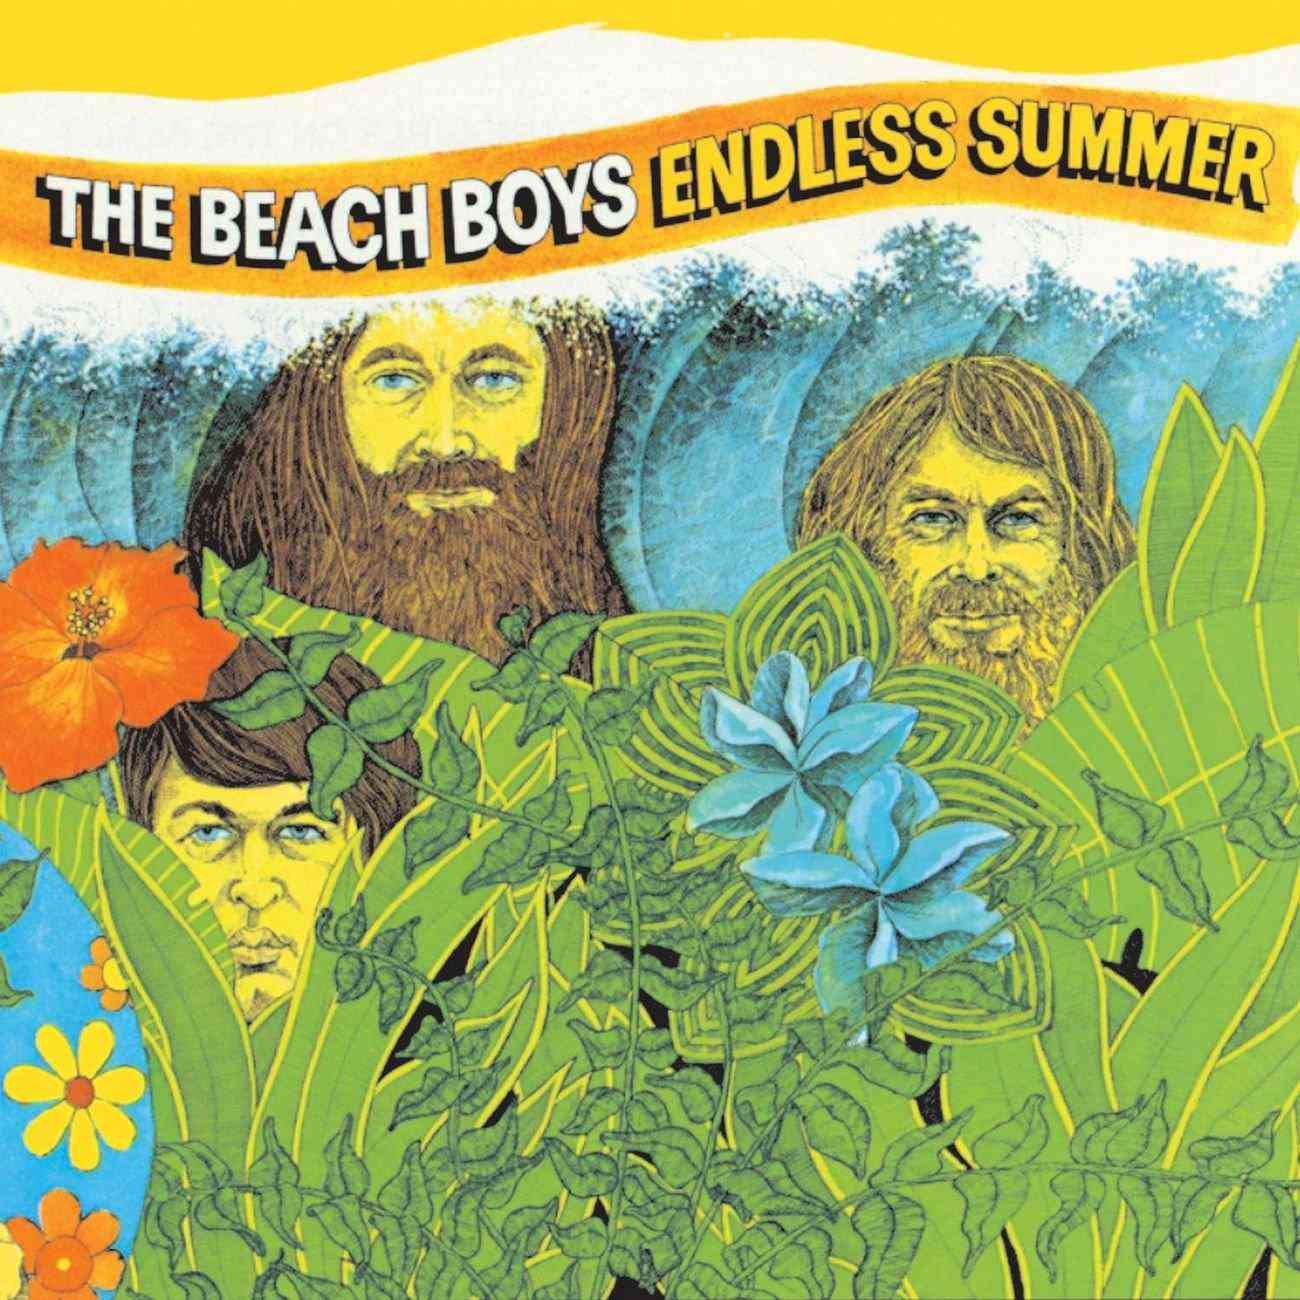 Beach Boys Endless Summer